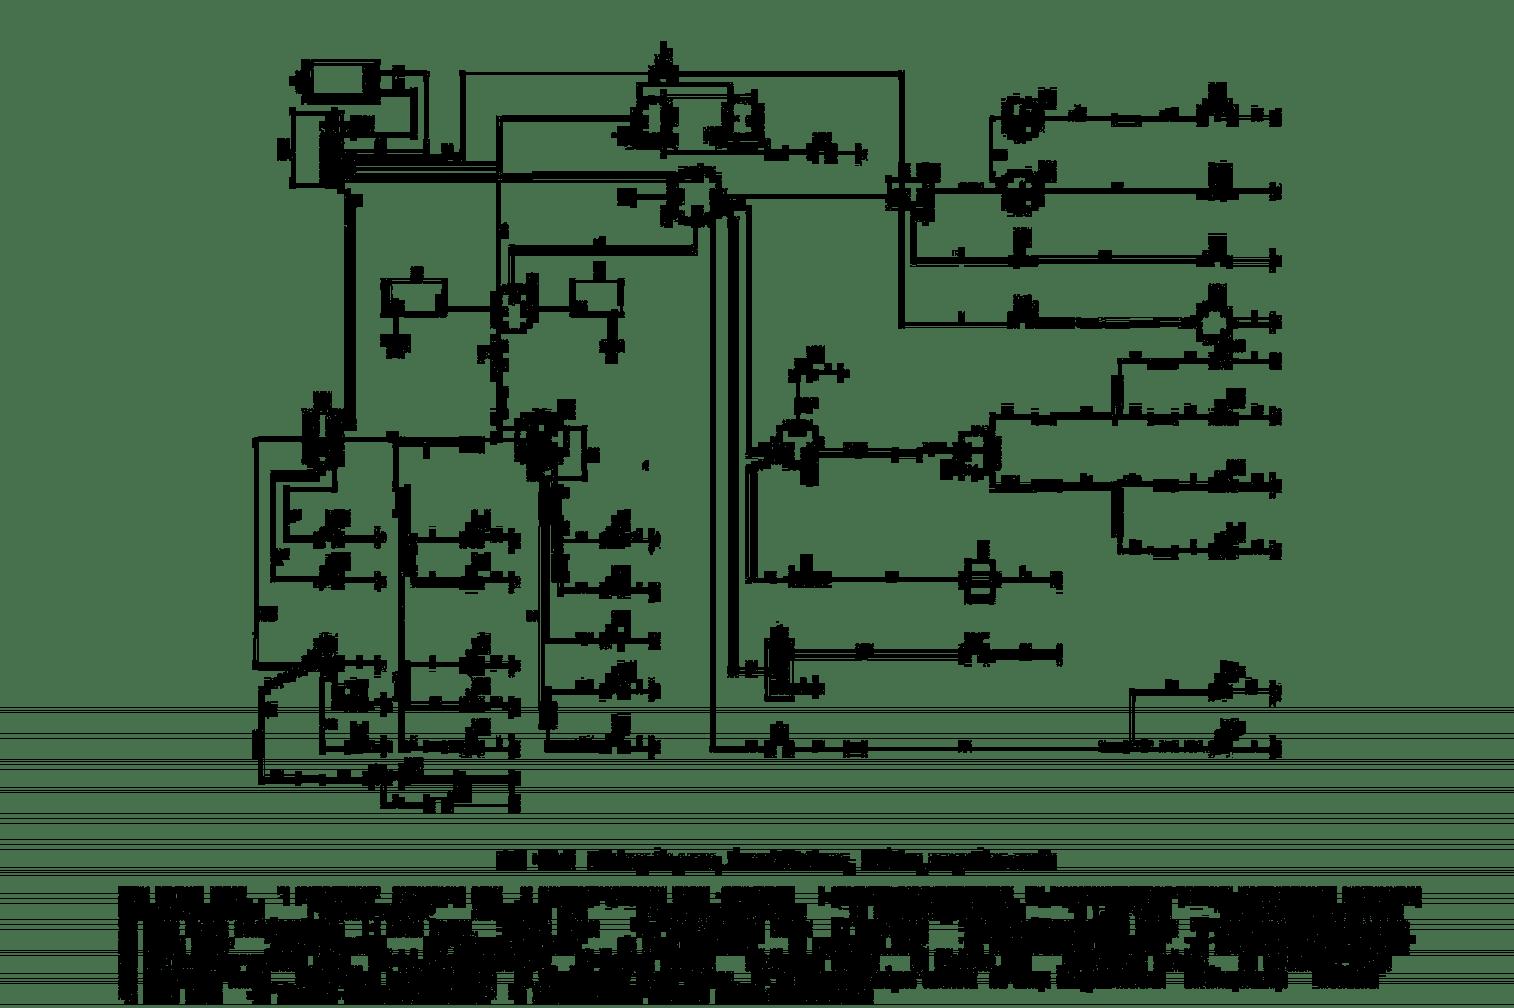 alfa romeo remote start wiring diagram alfa wiring diagrams Jeep Wiring Diagrams alfa romeo start wiring diagram